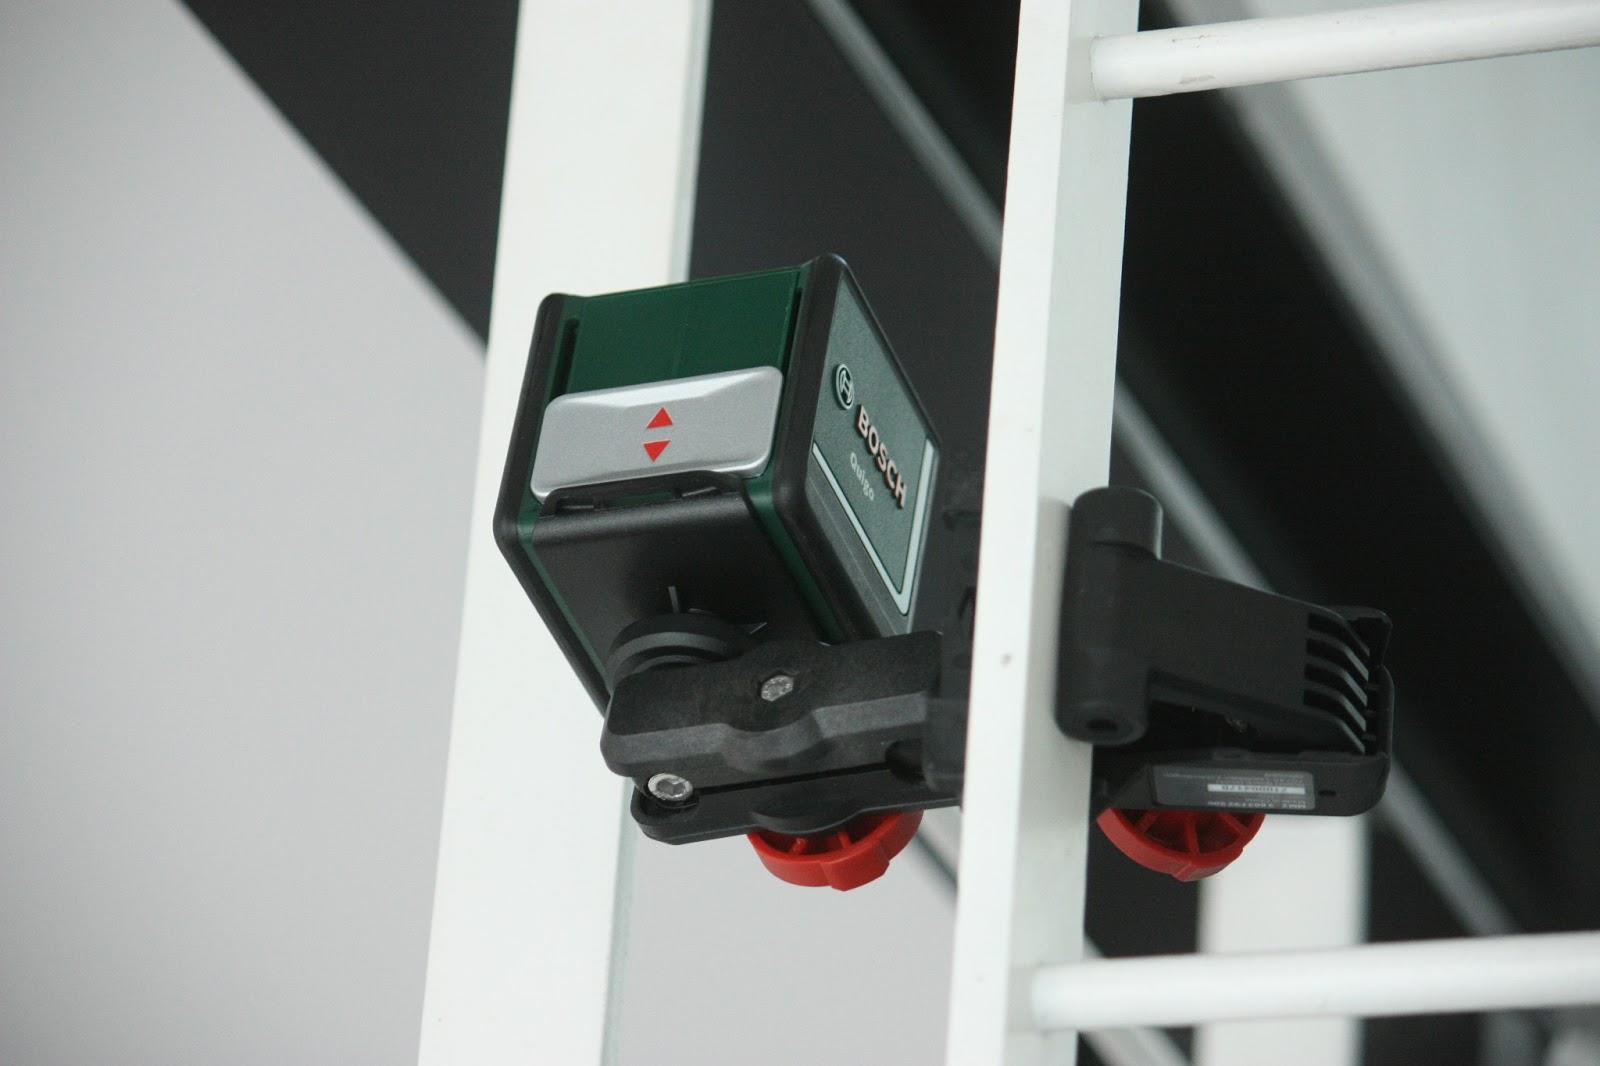 un nouveau regard niveau laser quigo 2 par bosch. Black Bedroom Furniture Sets. Home Design Ideas